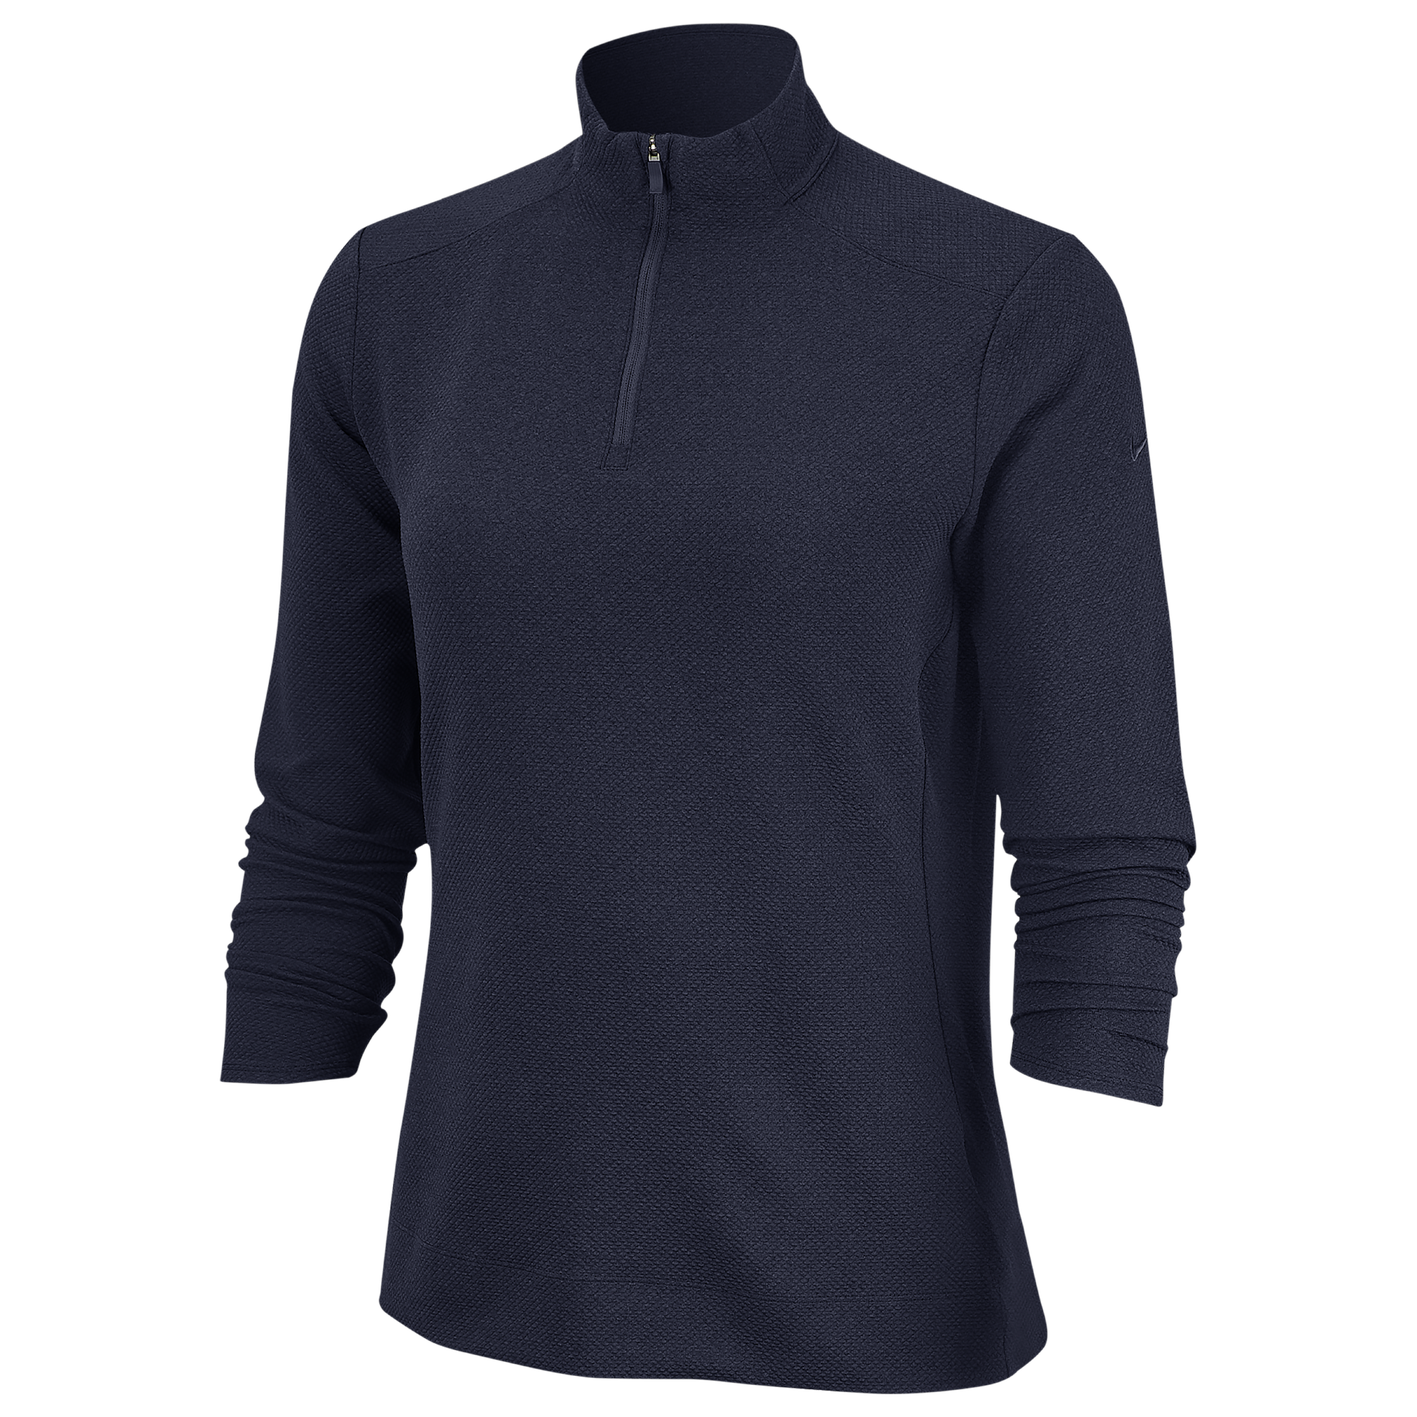 6867b9bf0 Nike Dri-FIT UV 1/4 Zip Golf Top - Women's - Golf - Clothing ...